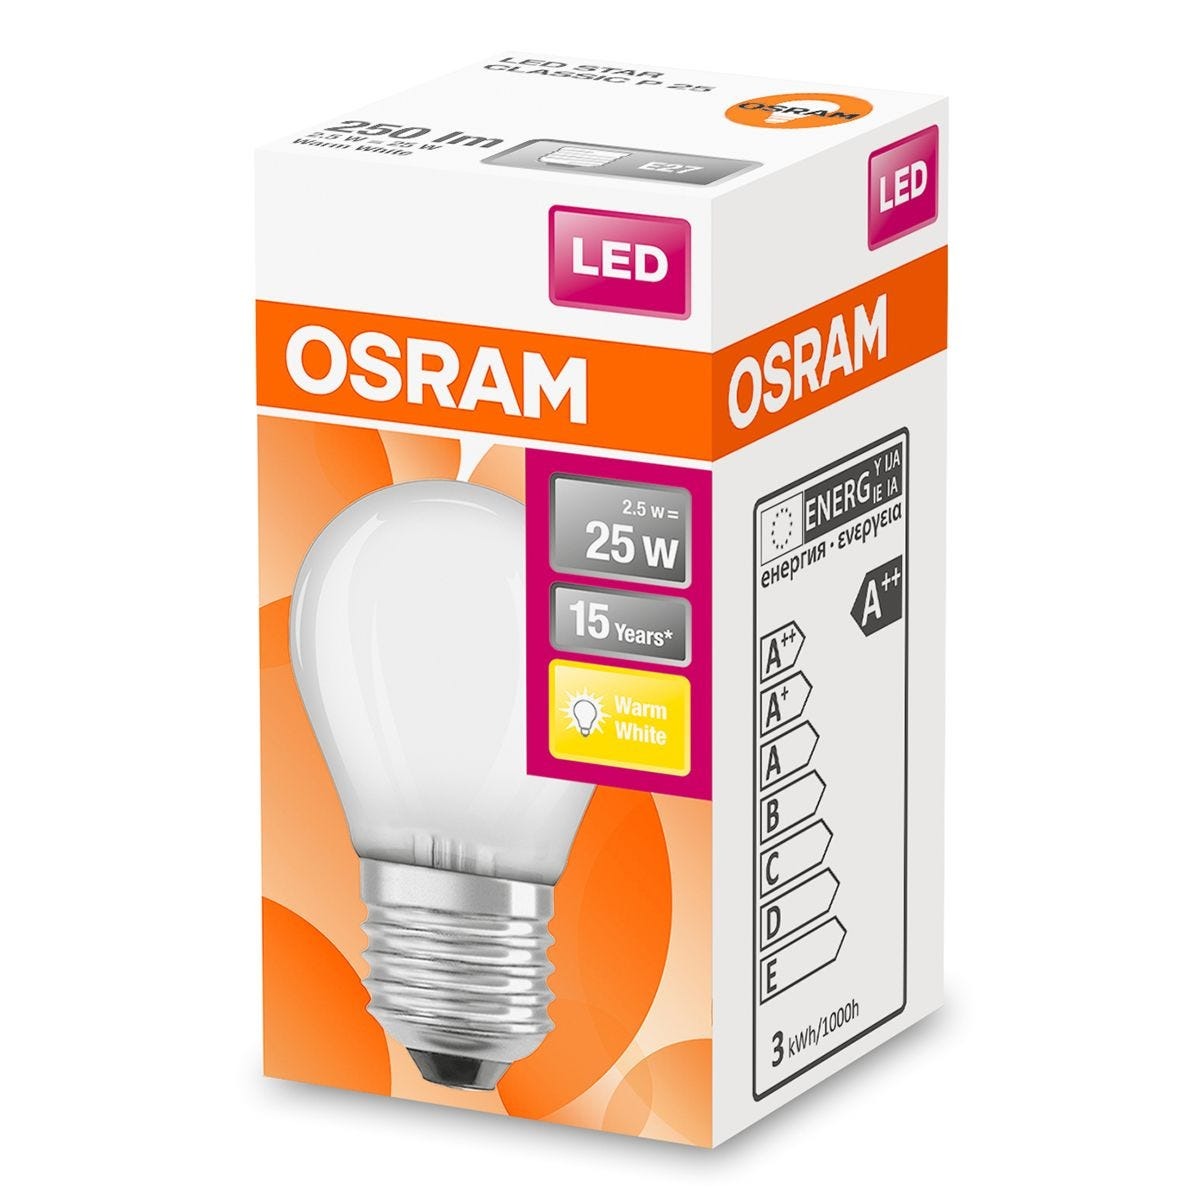 Osram Globe 25W LED Filament Frosted ES Bulb